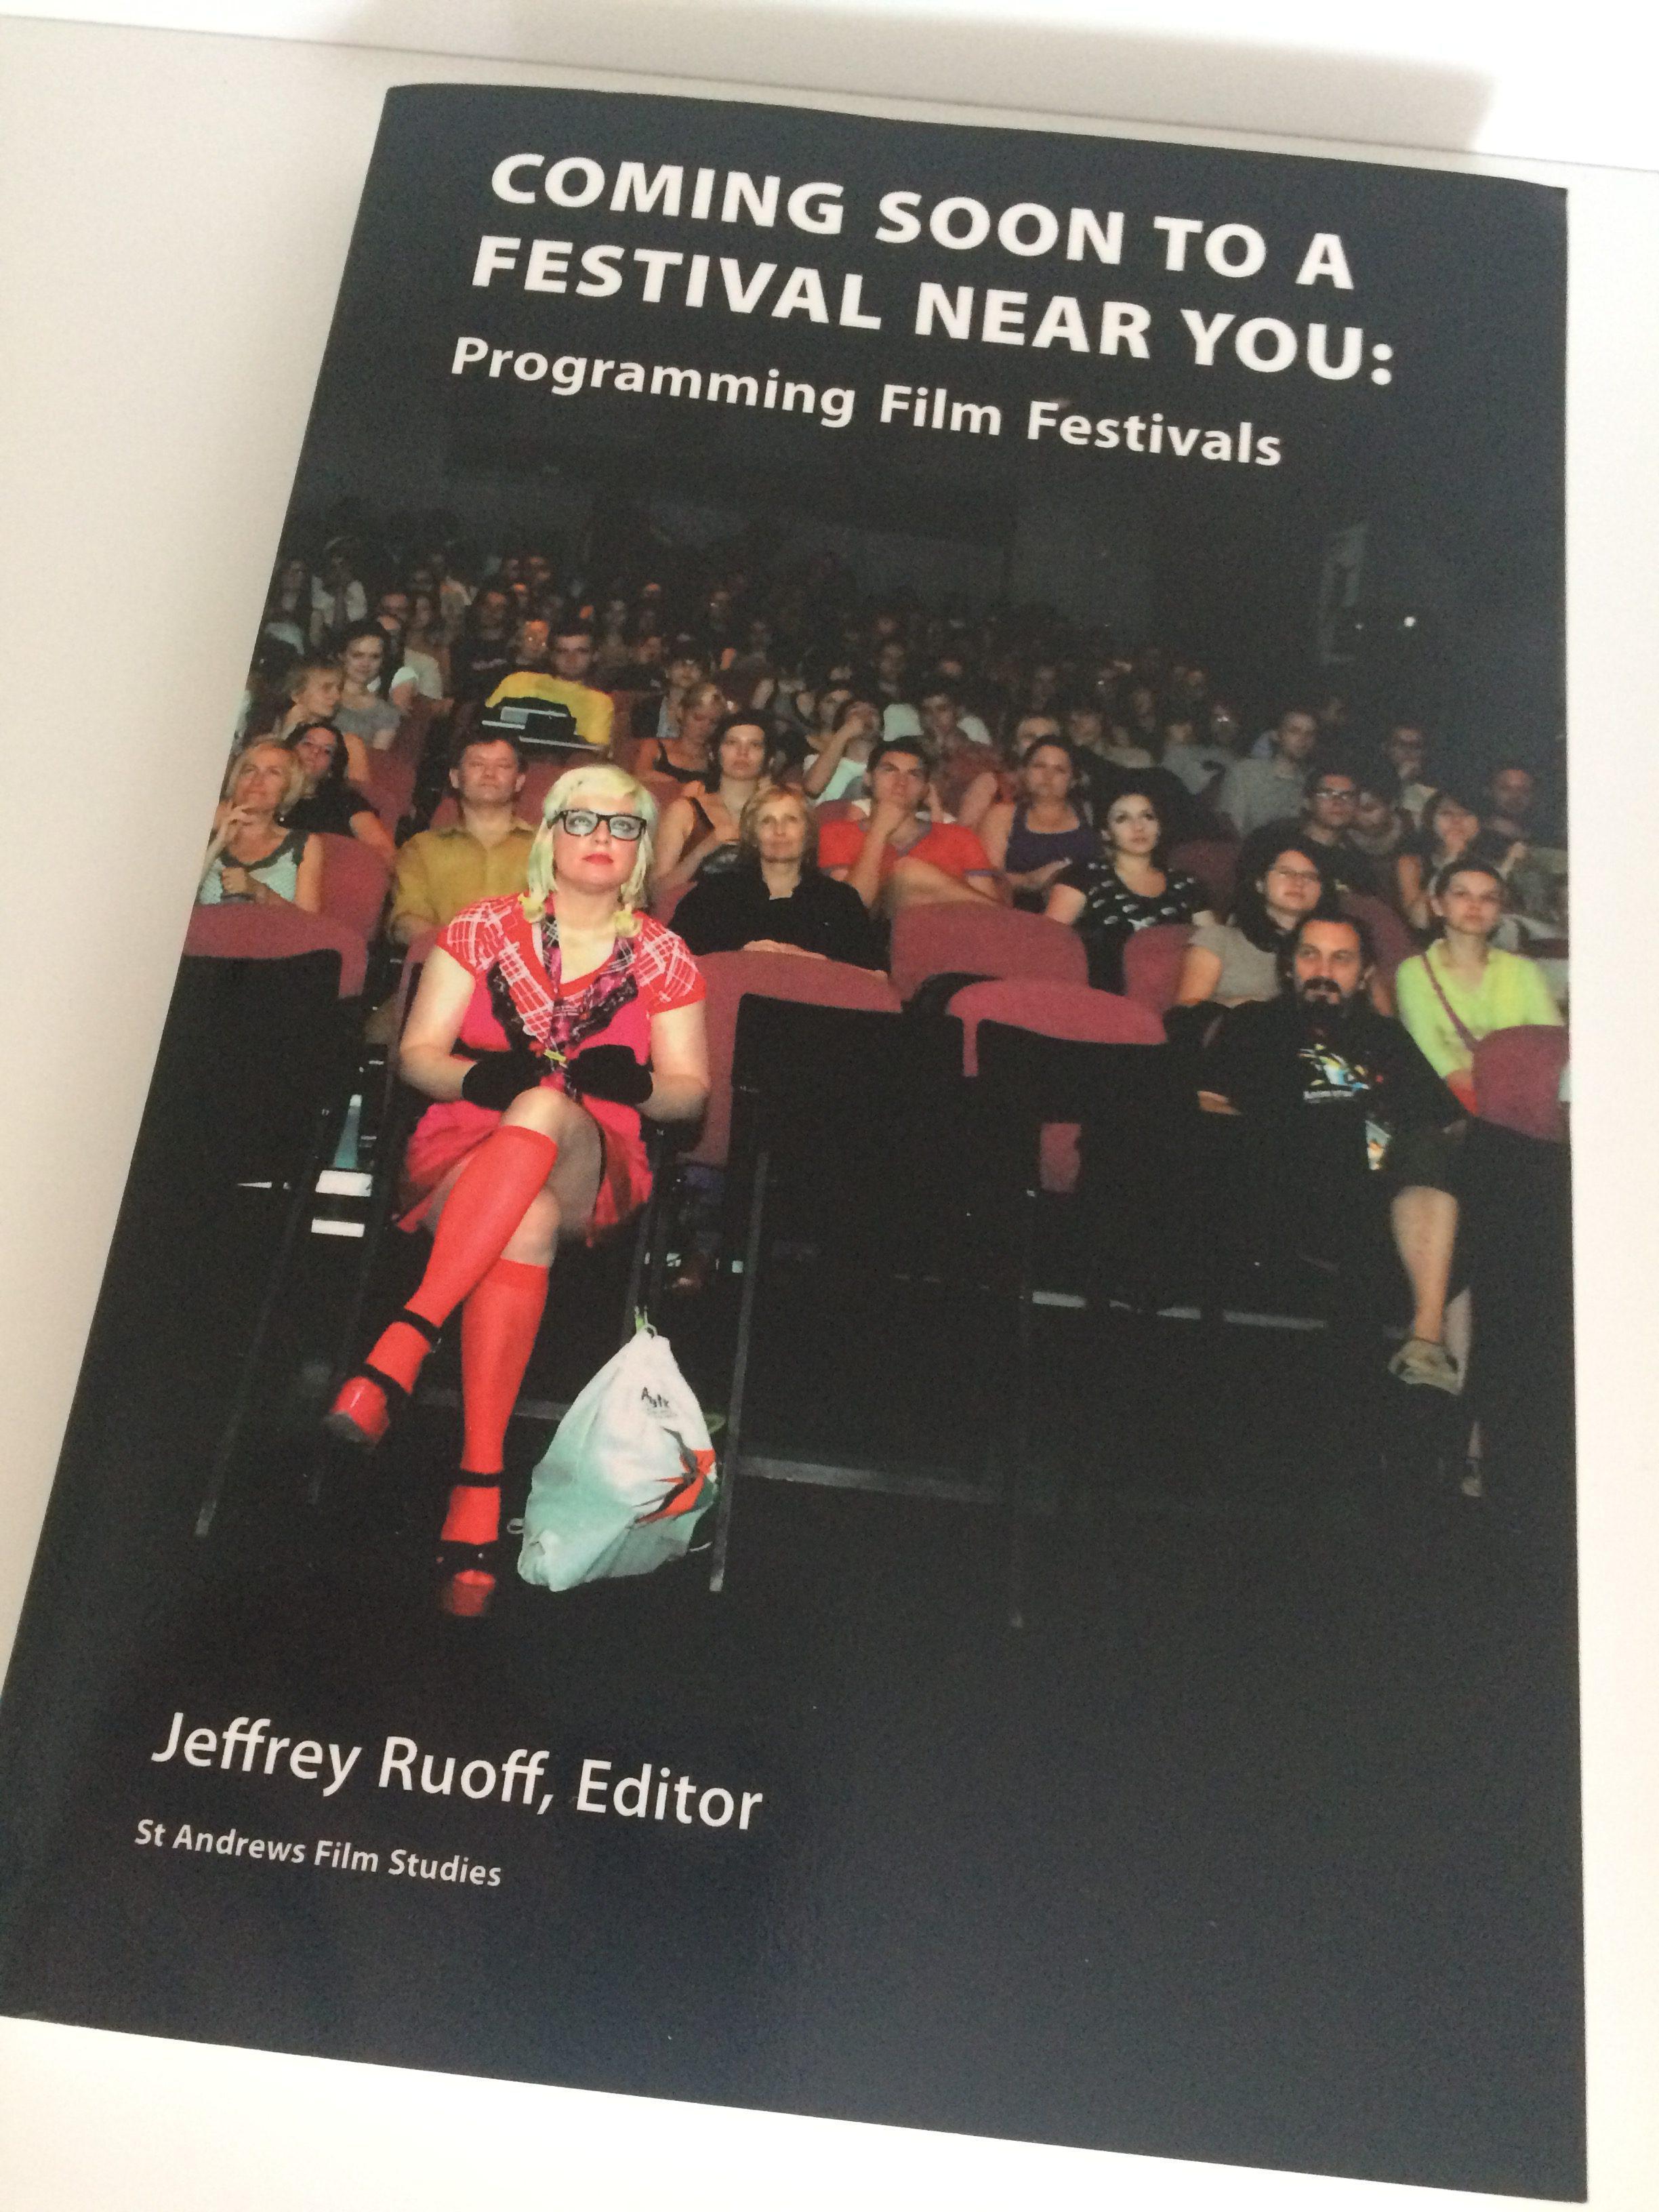 Boekbespreking: Jeffrey Ruoff (ed. 2012)